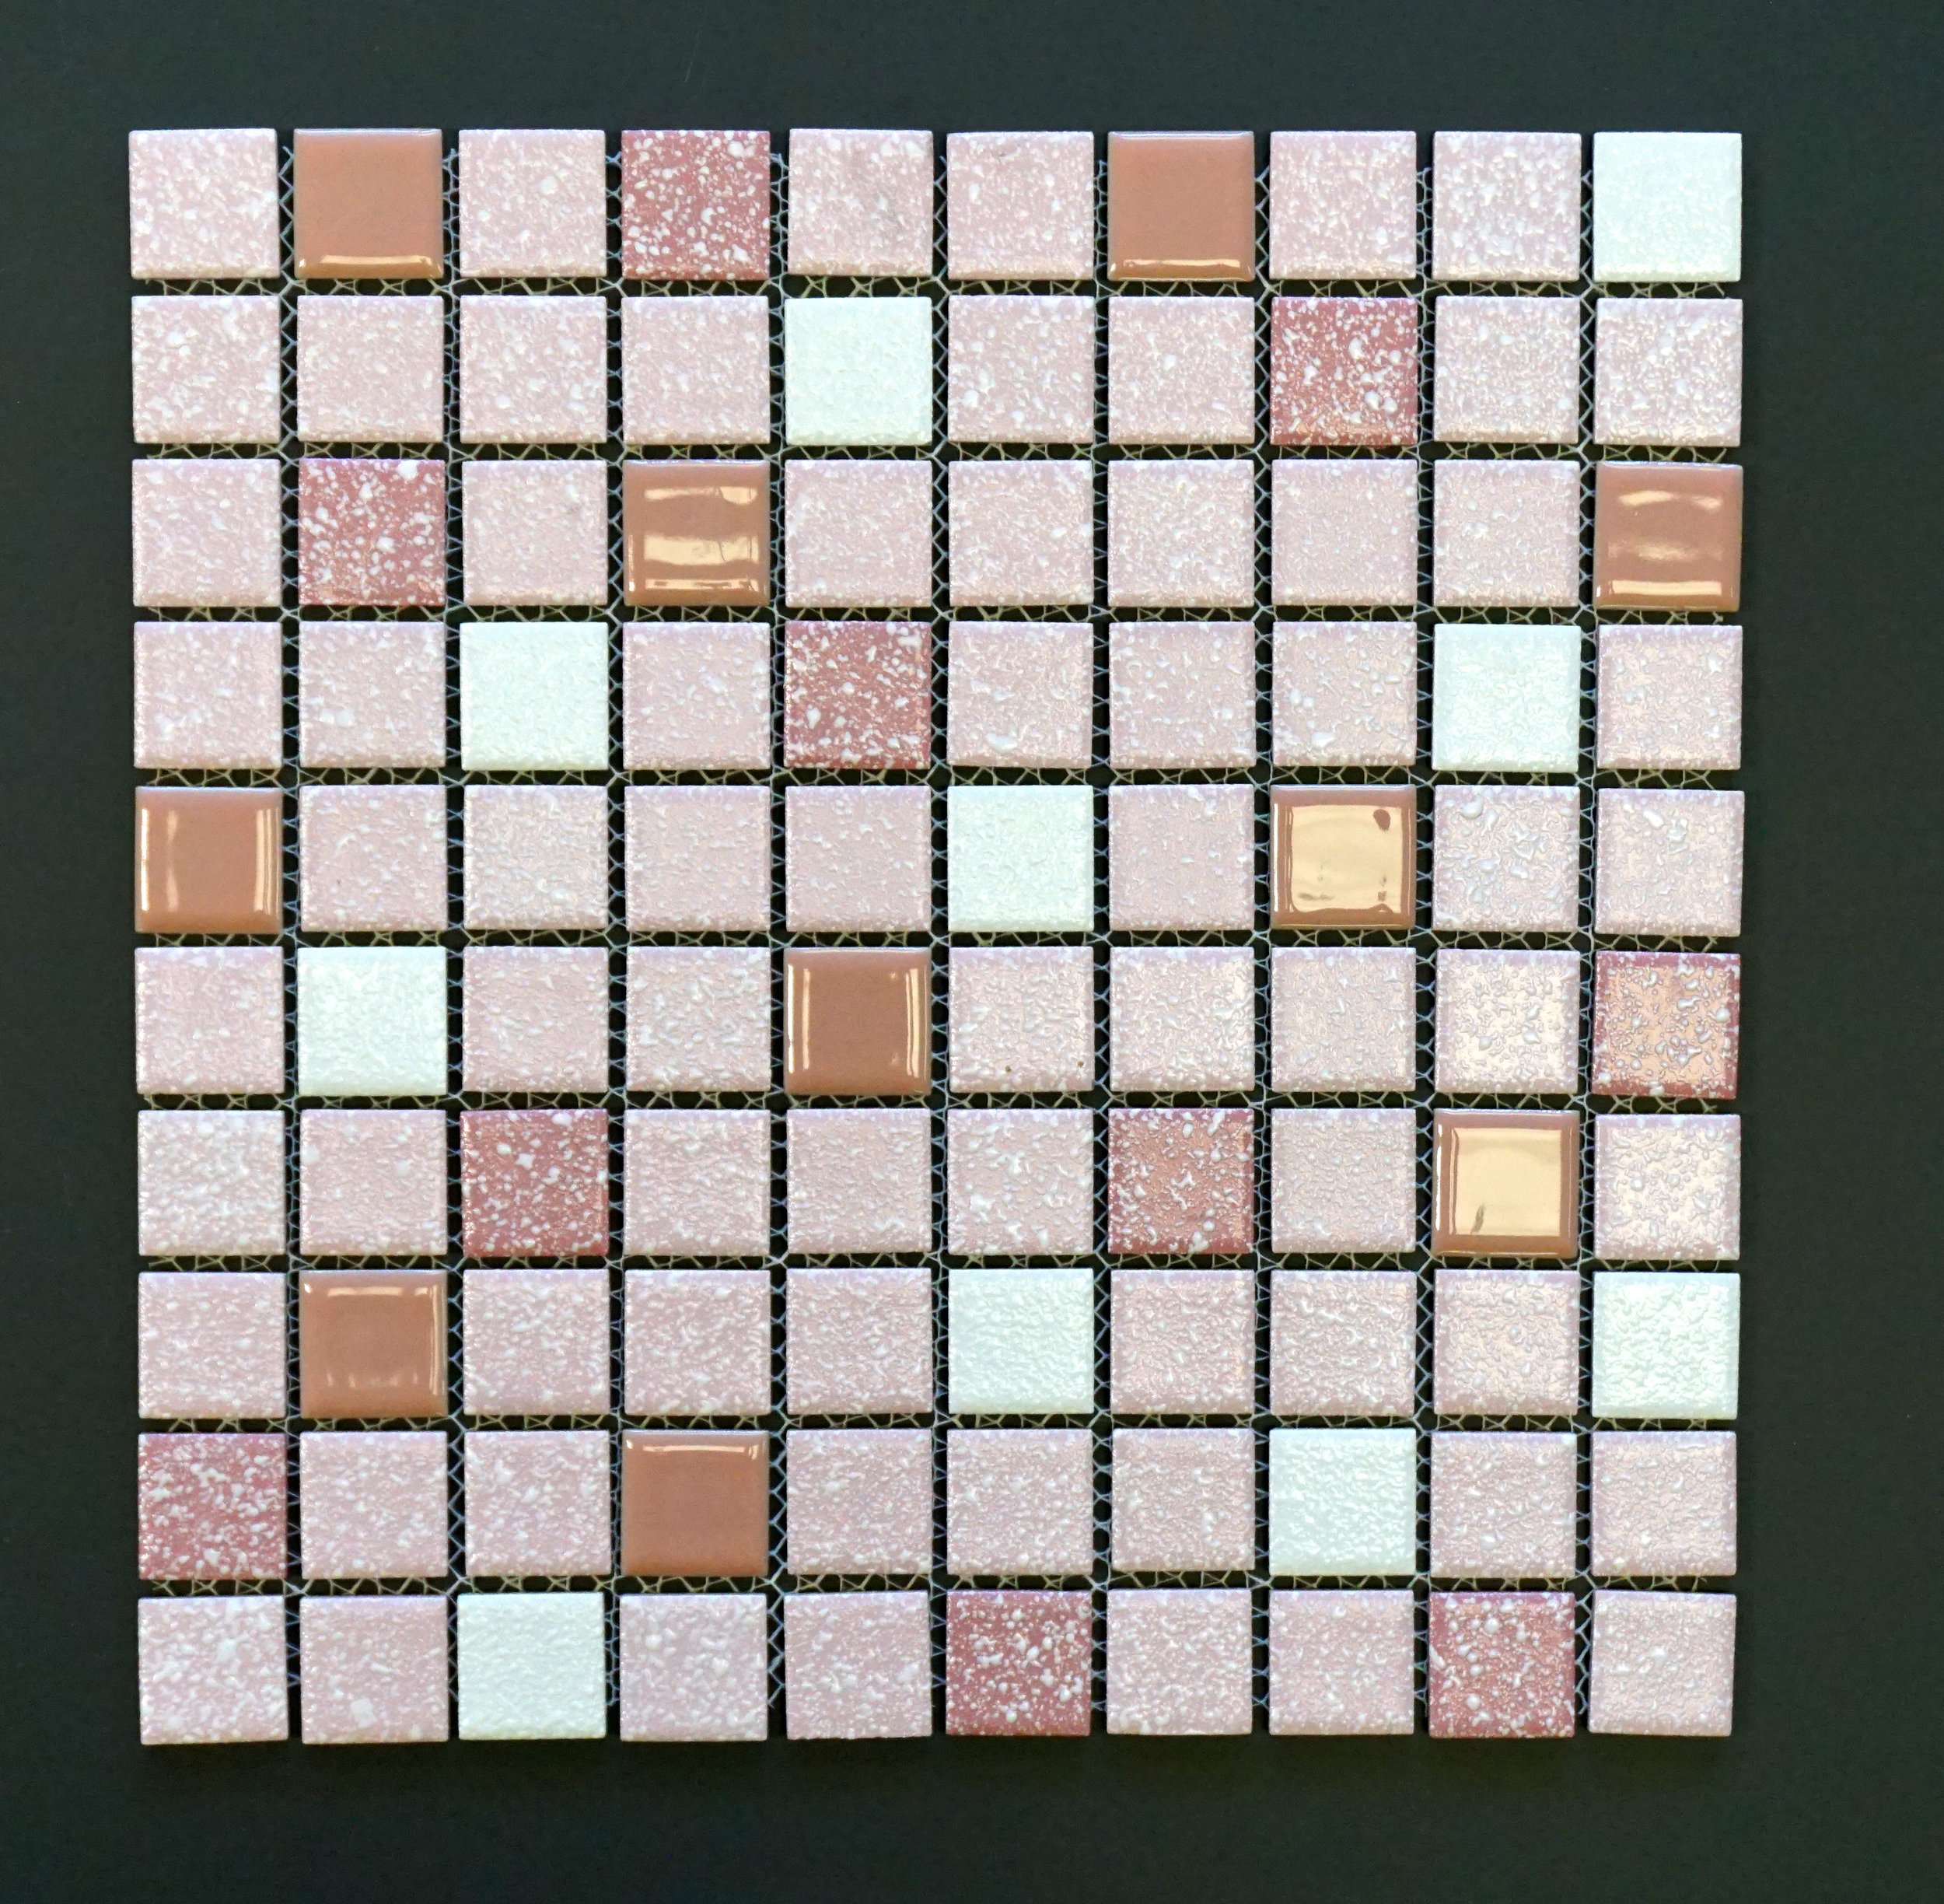 KKM 918 - Pink   1.00 sf/pc   30 sf/ctn   36 ctn/plt